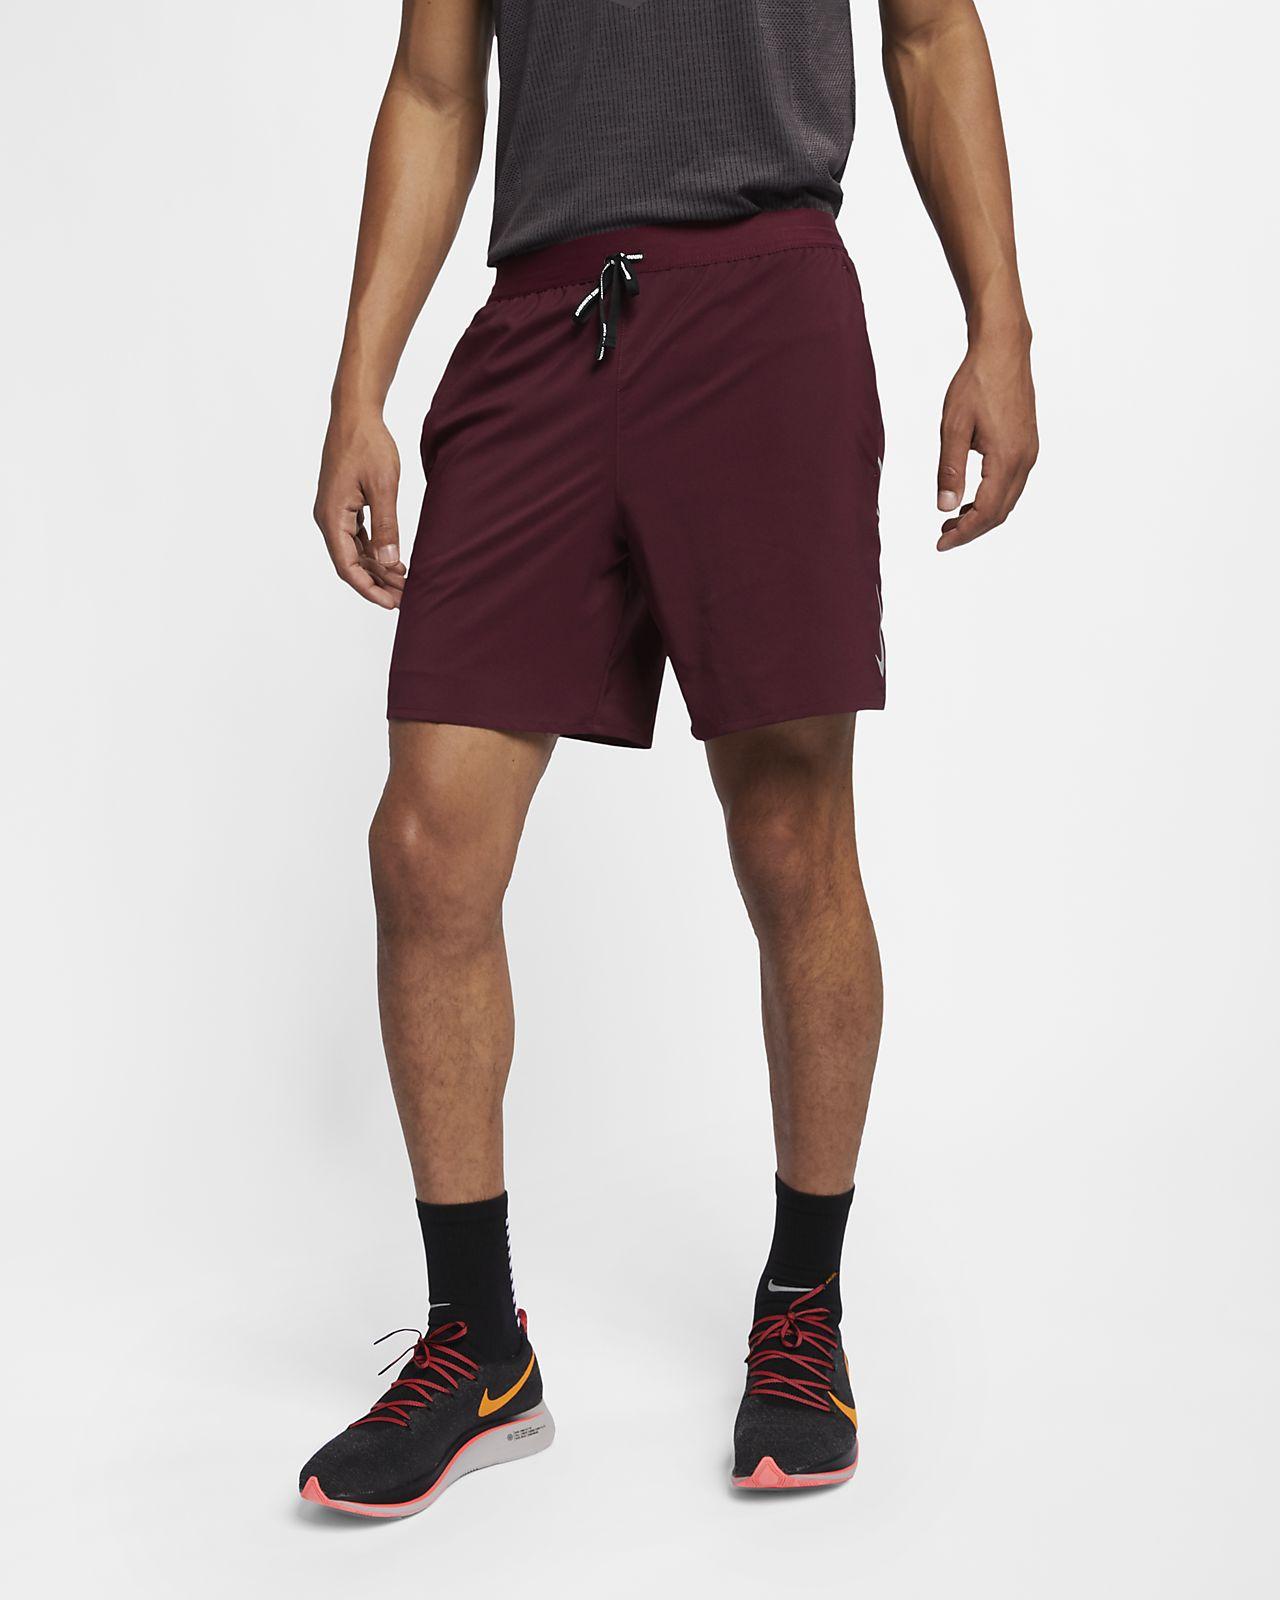 85aabdc8ce08b Nike Dri-FIT Flex Stride Men s 7